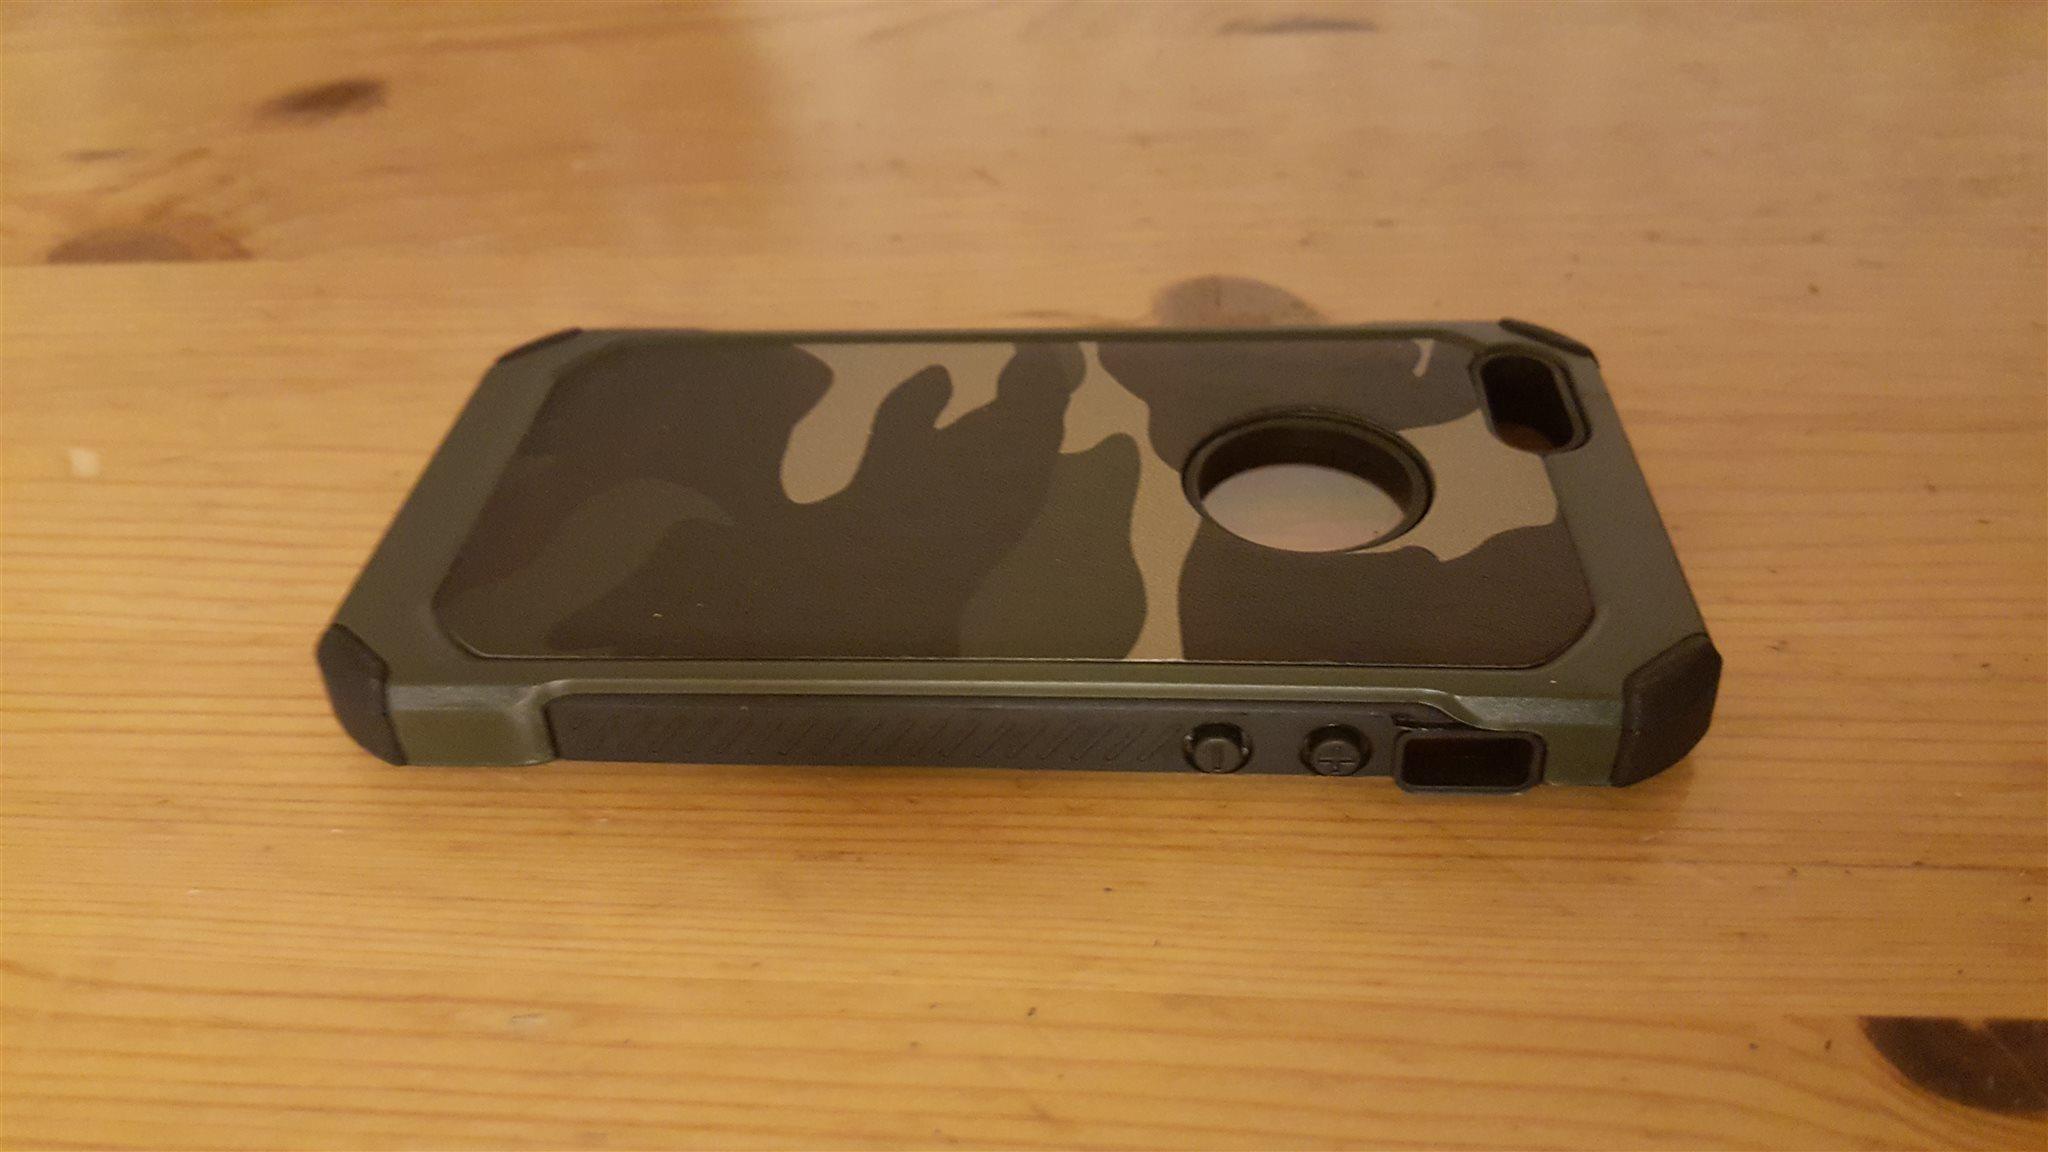 Camouflage Armor TPU + PC Hård skal till iPhon.. (335799113) ᐈ Köp ... 049aac6f88c6c